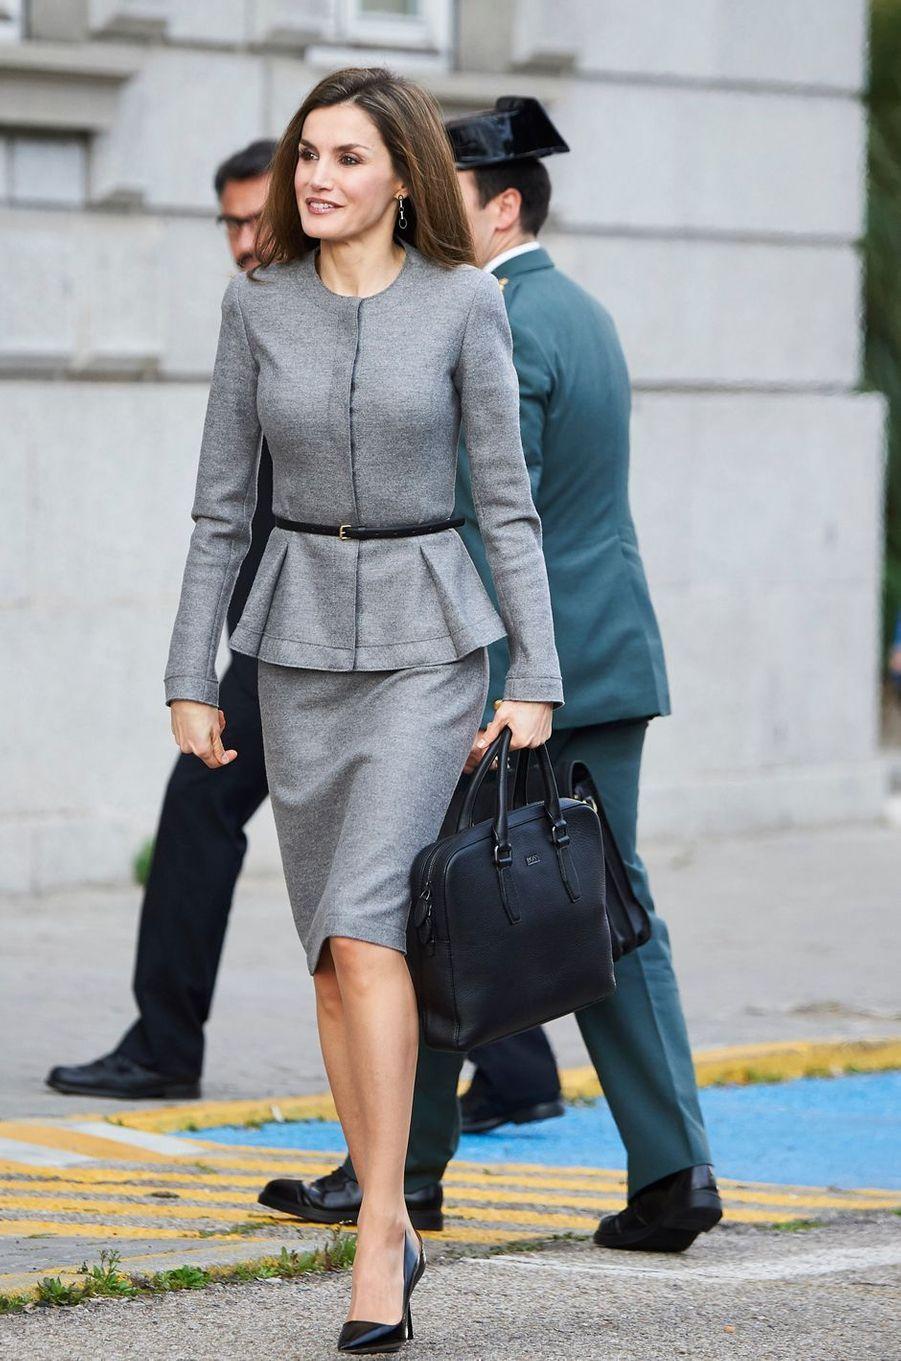 La reine Letizia d'Espagne en Carolina Herrera à Madrid, le 7 mars 2017